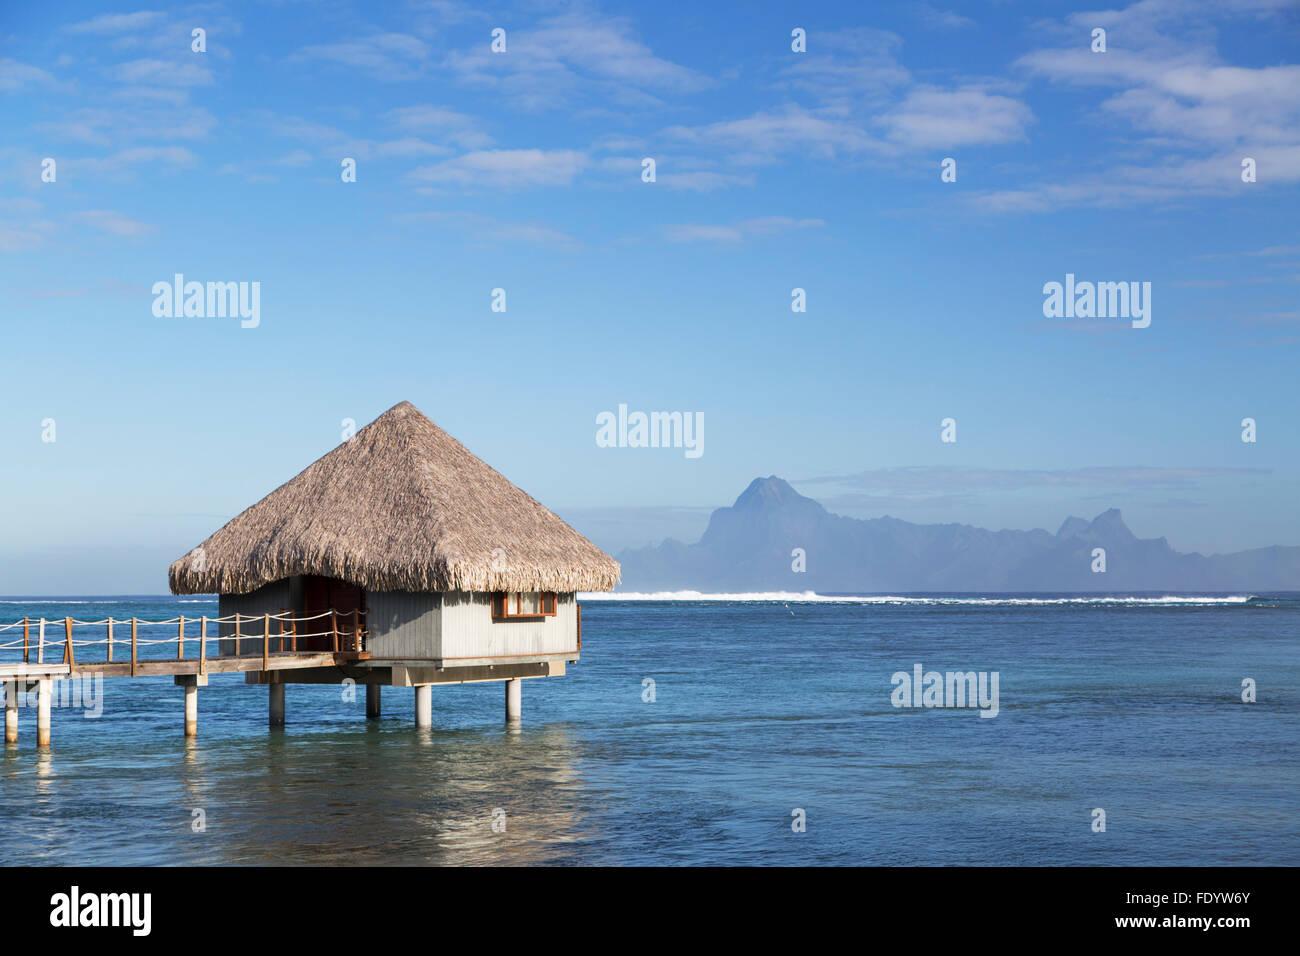 Overwater bungalow at Le Meridien Tahiti Hotel, Pape'ete, Tahiti, French Polynesia - Stock Image